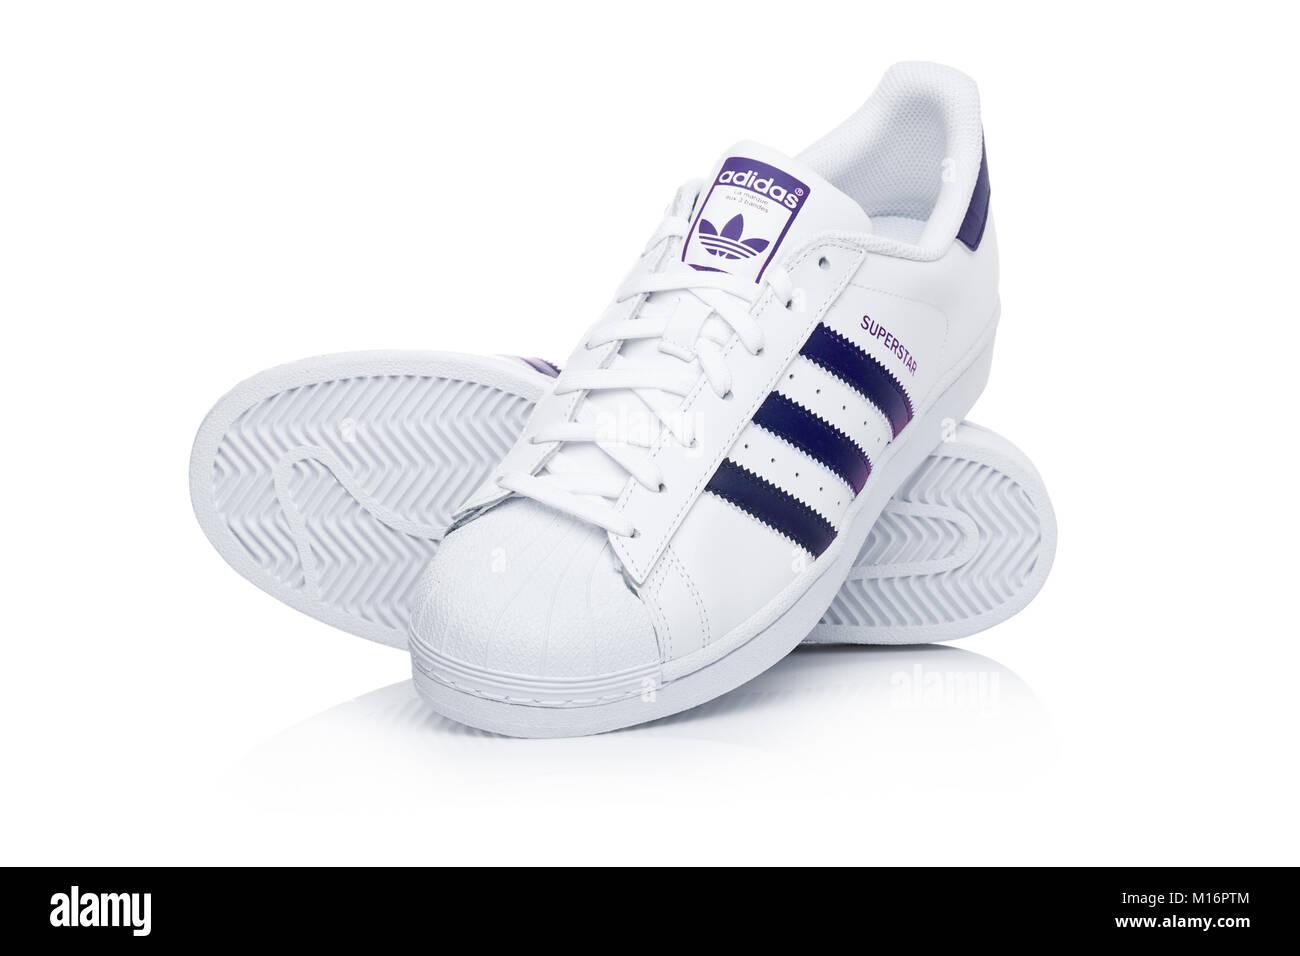 fabbricazione scarpe adidas